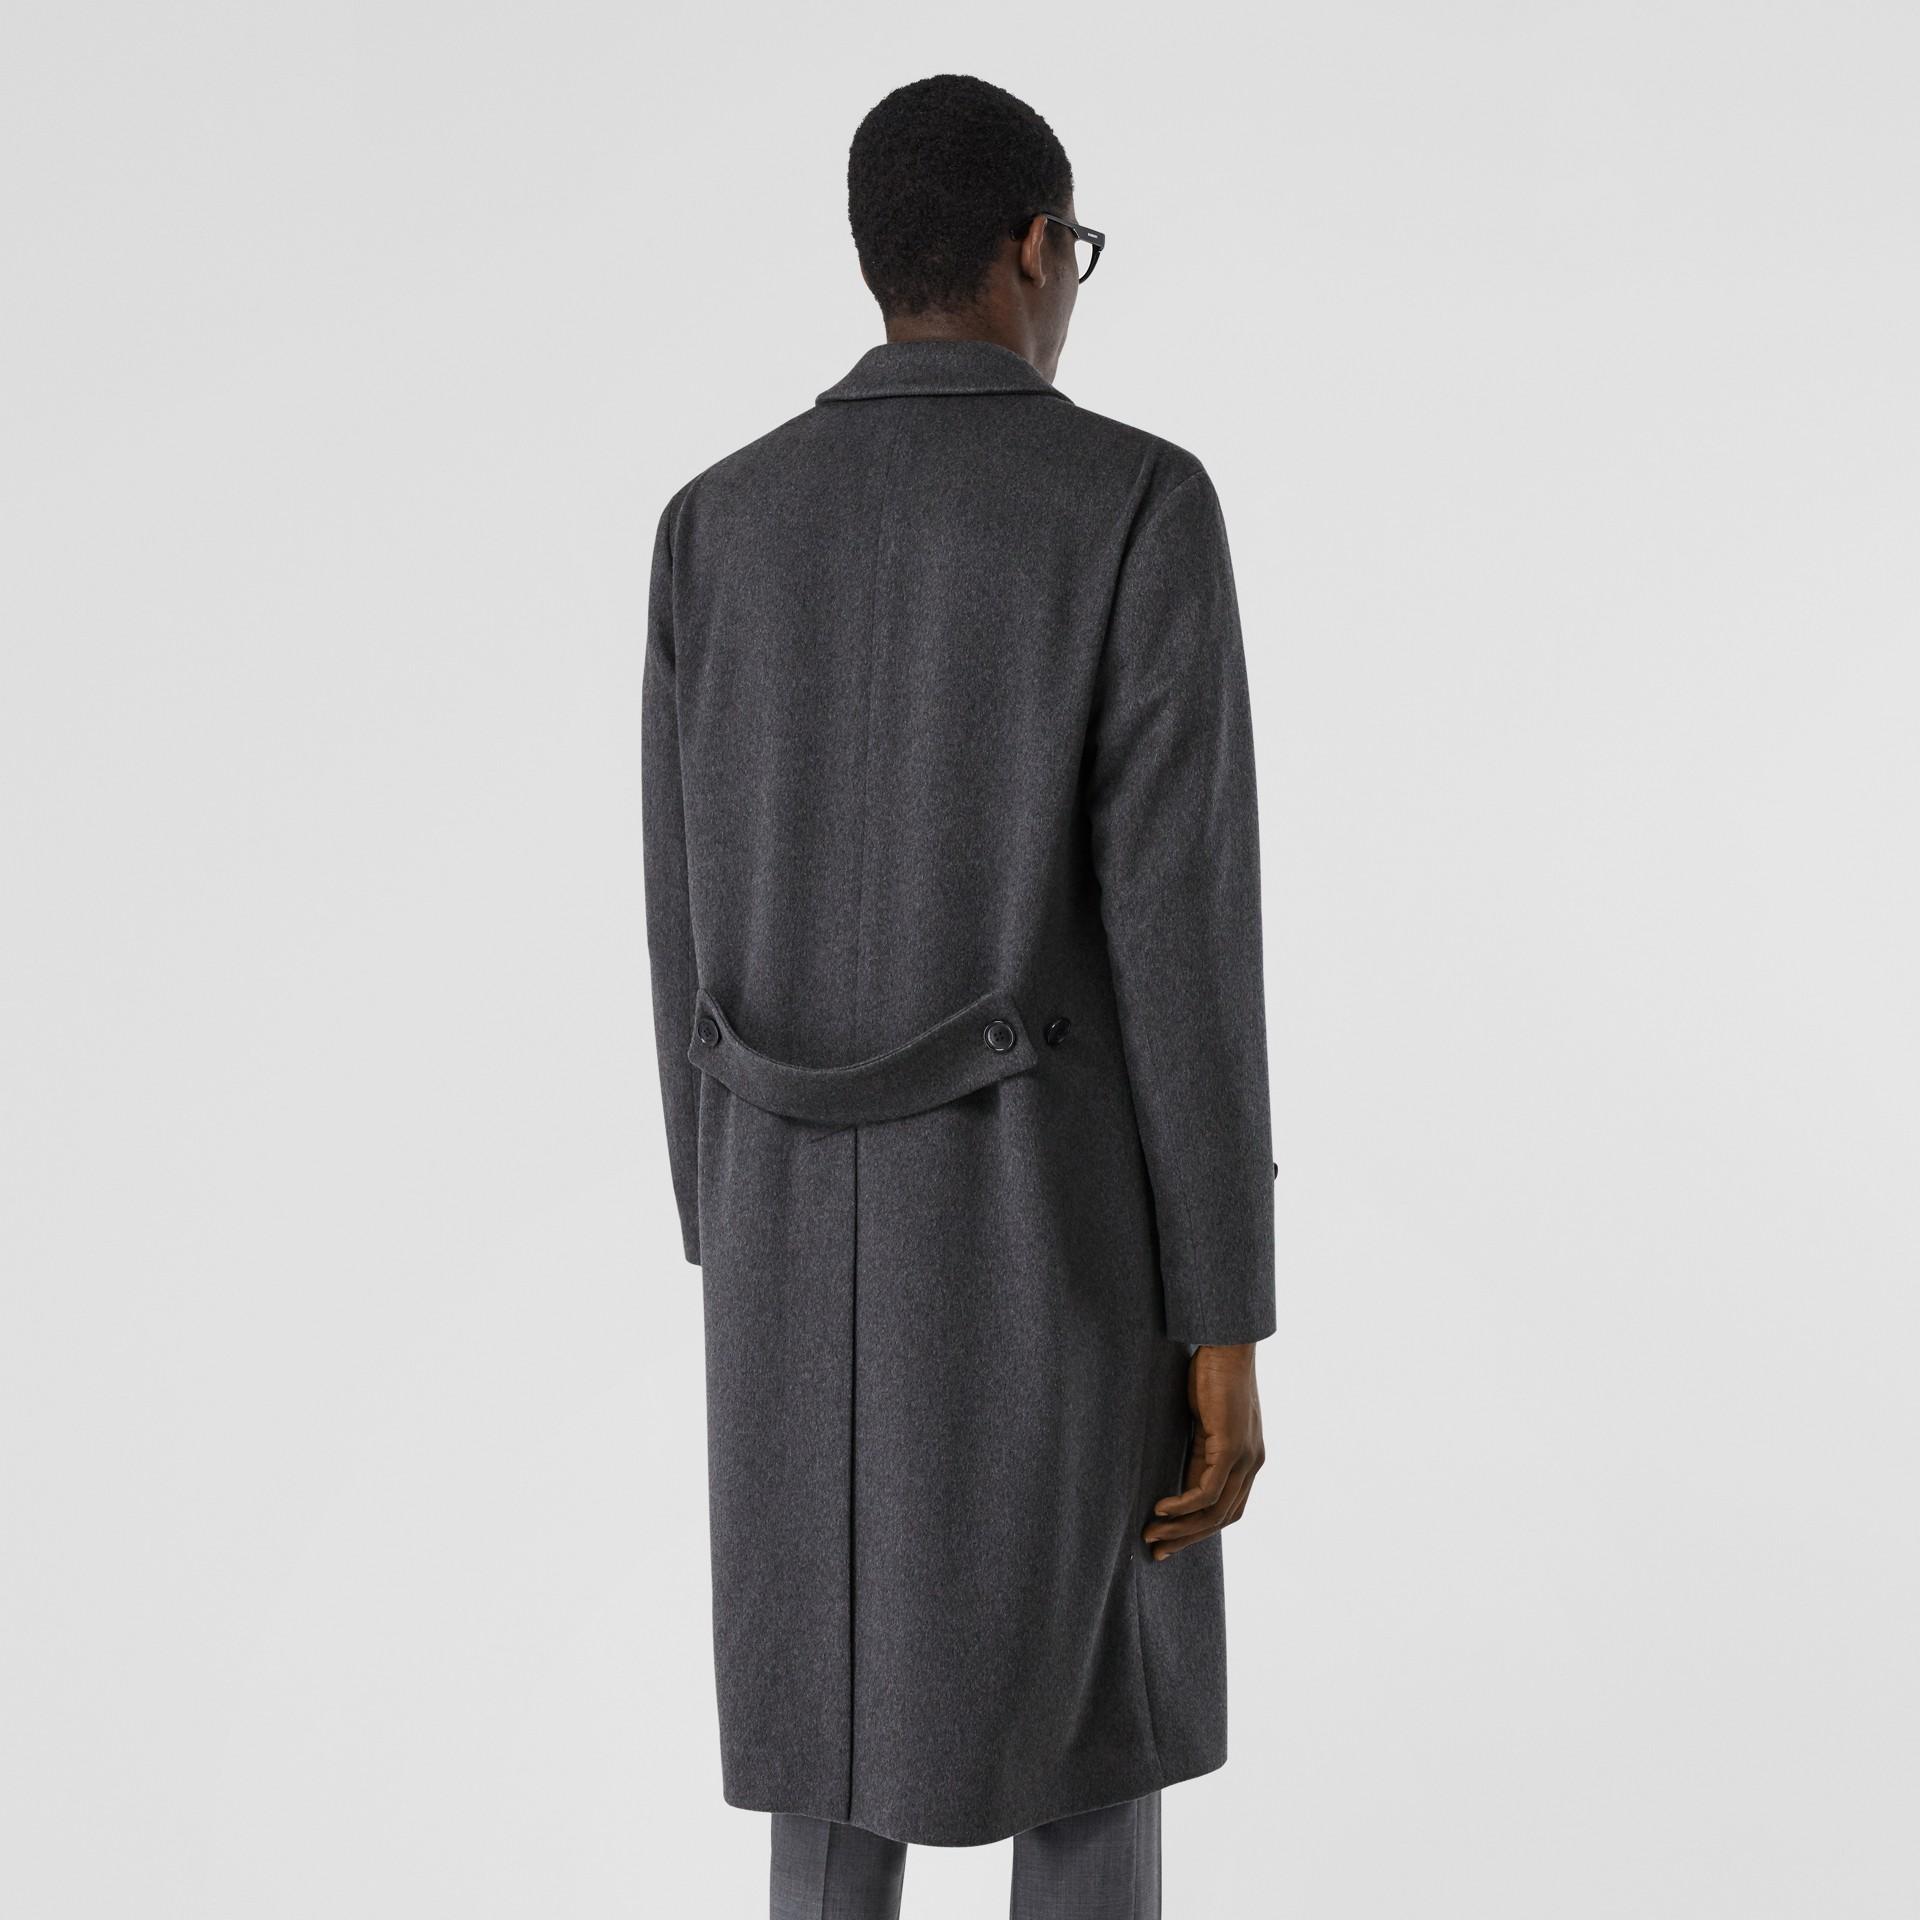 Cashmere Lab Coat in Pewter Melange - Men | Burberry - gallery image 2